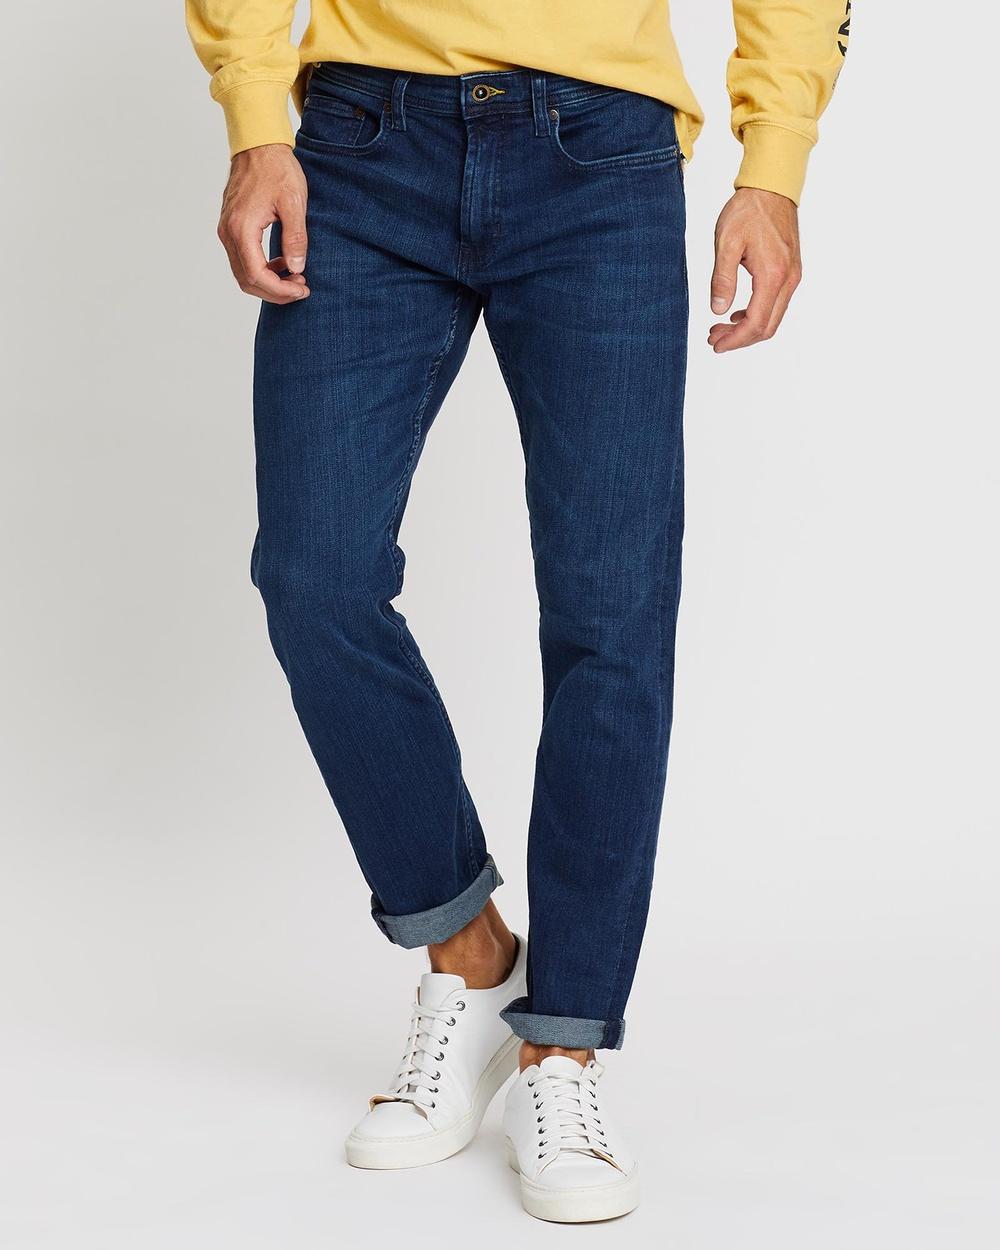 Rodd & Gunn Briggs Straight Short Leg Jeans Denim